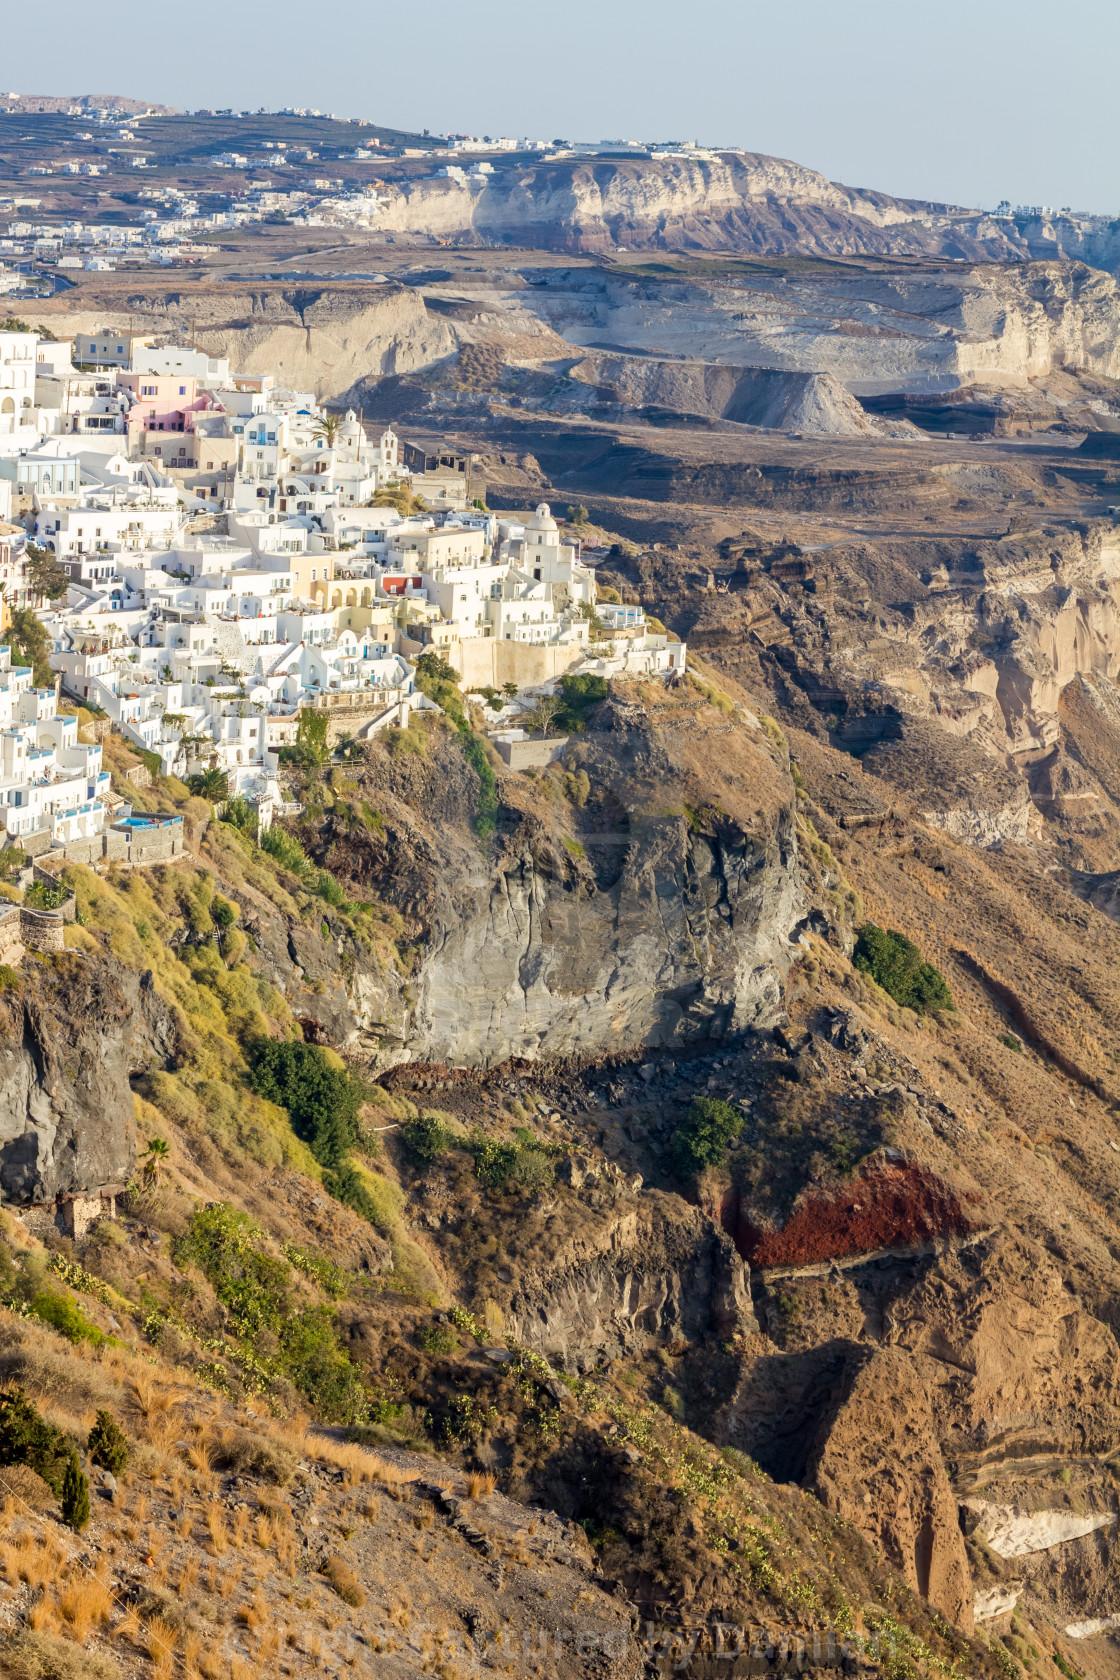 """Partial town view of Fira, Santorini, Greece"" stock image"